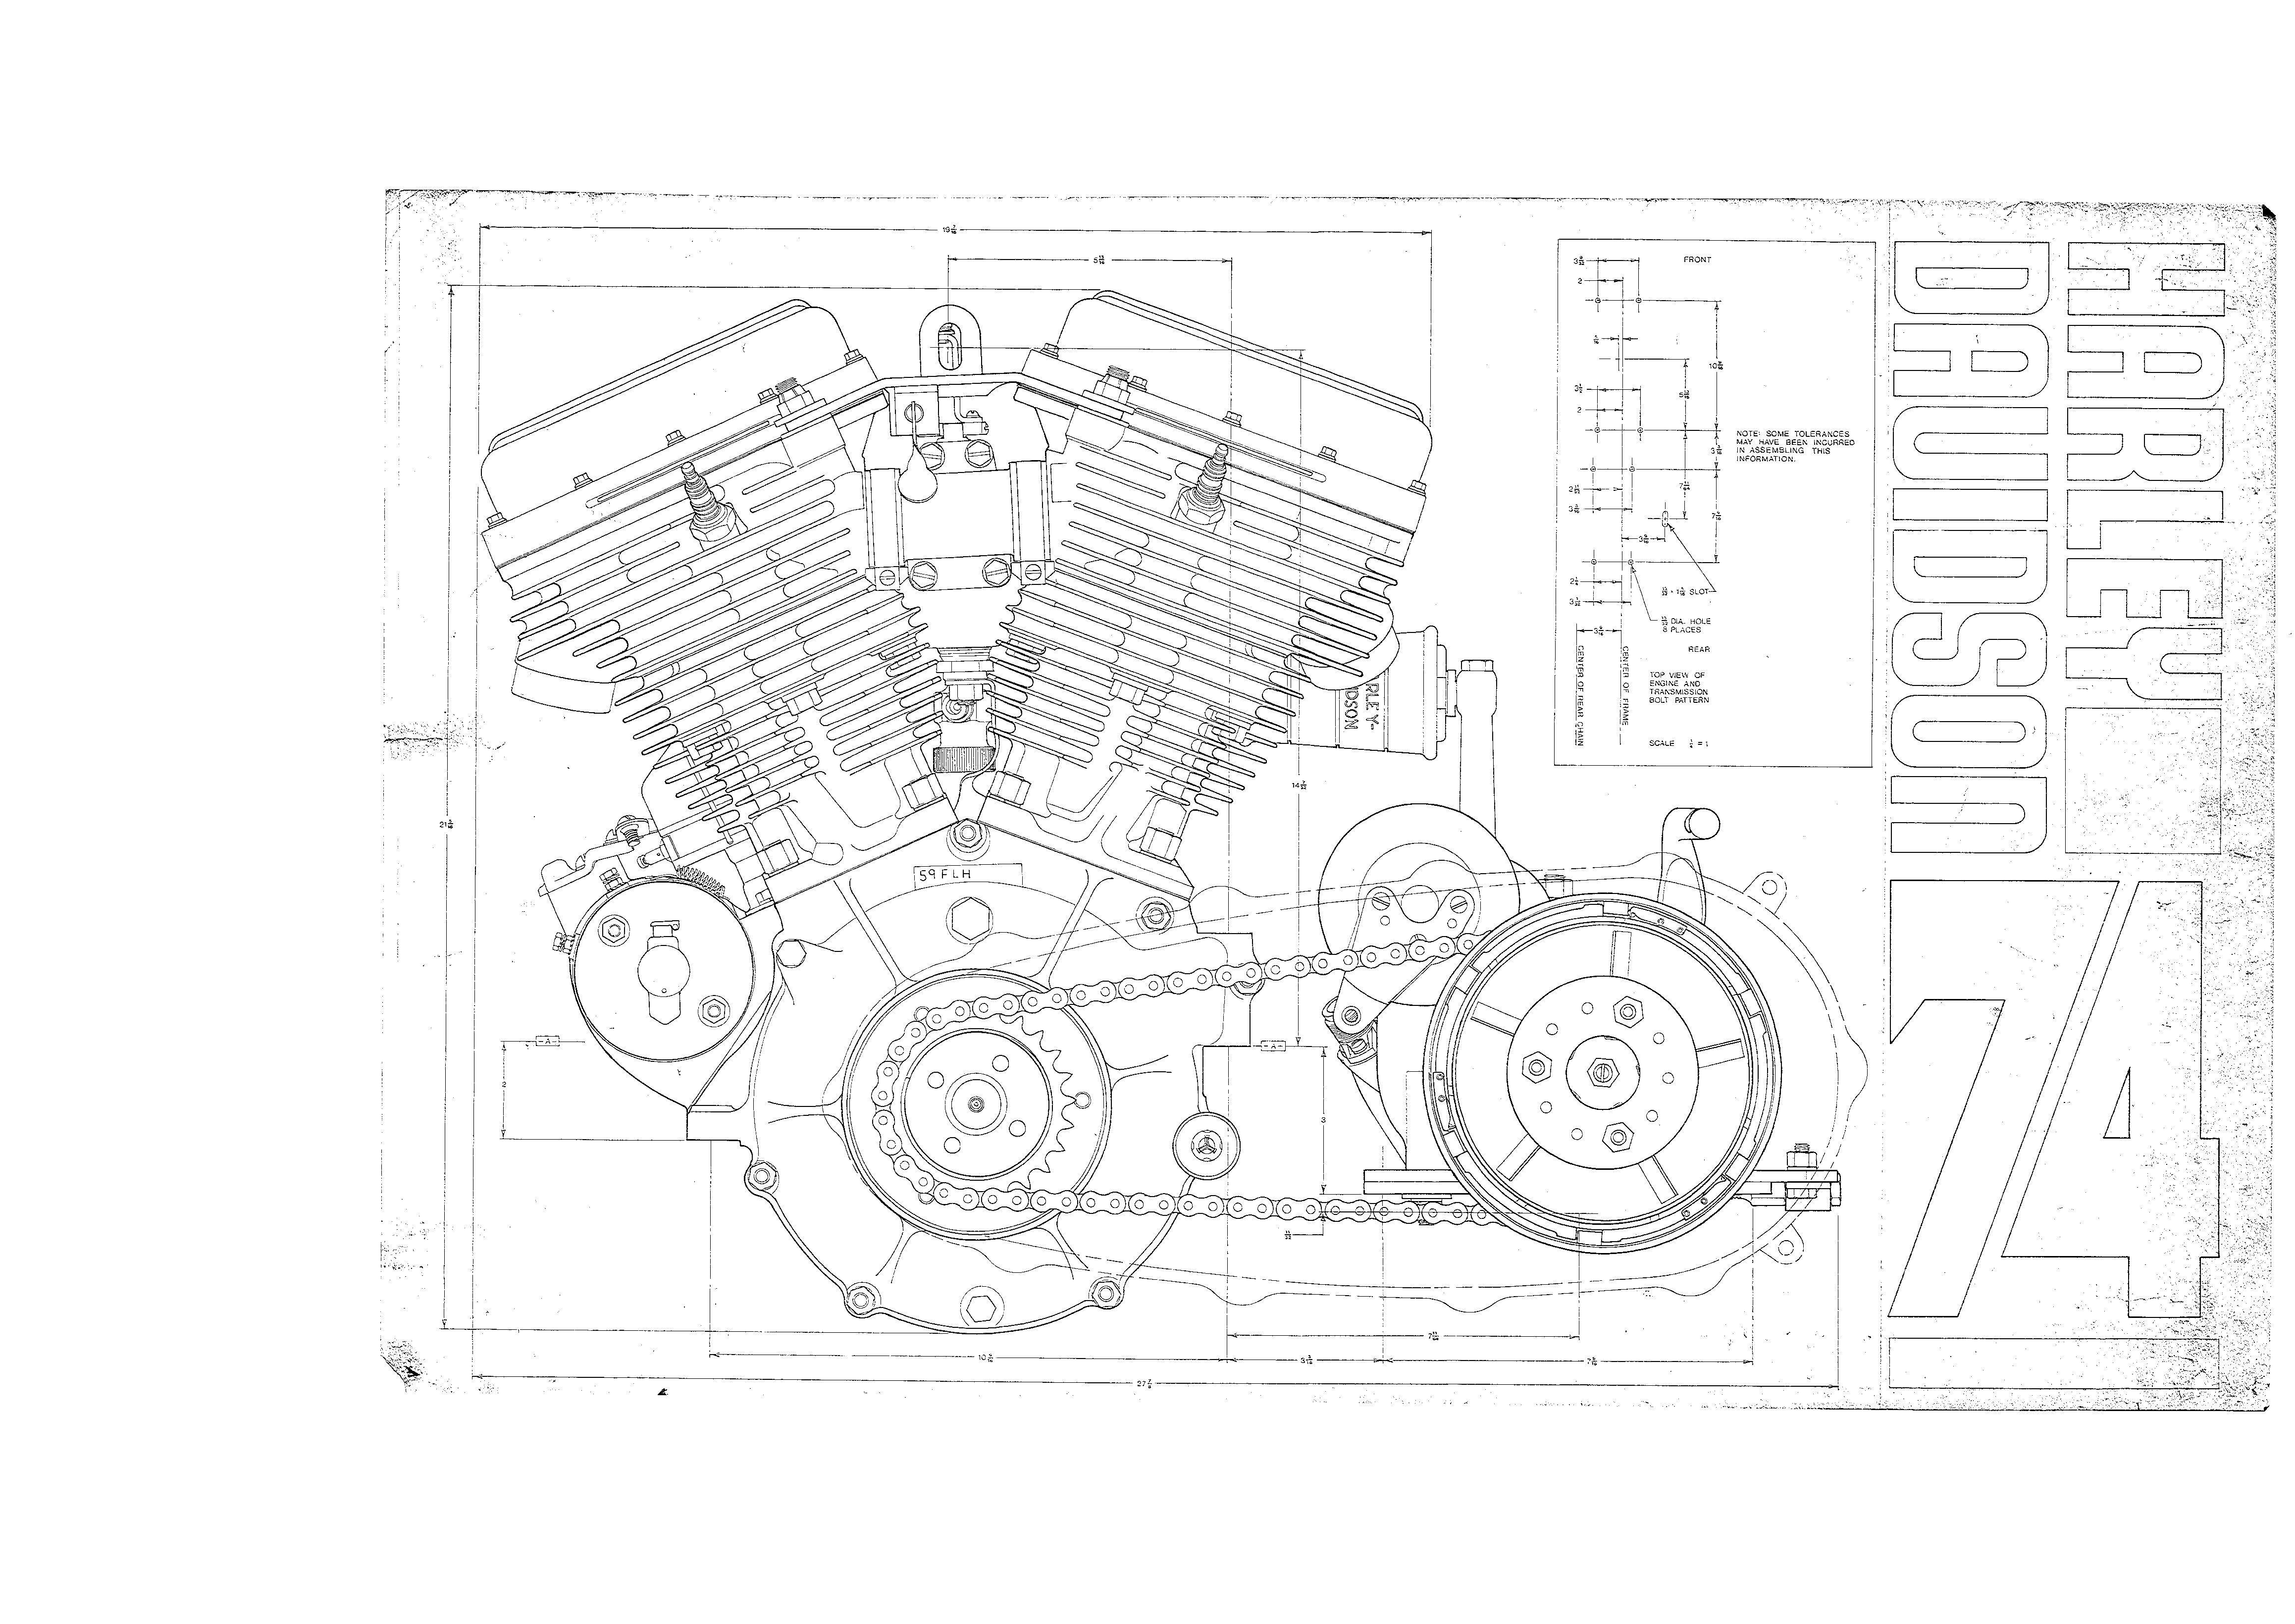 harley davidson motor harley davidson forum bike engine prop design custom harleys character design references engineering motorcycle  [ 4634 x 3279 Pixel ]